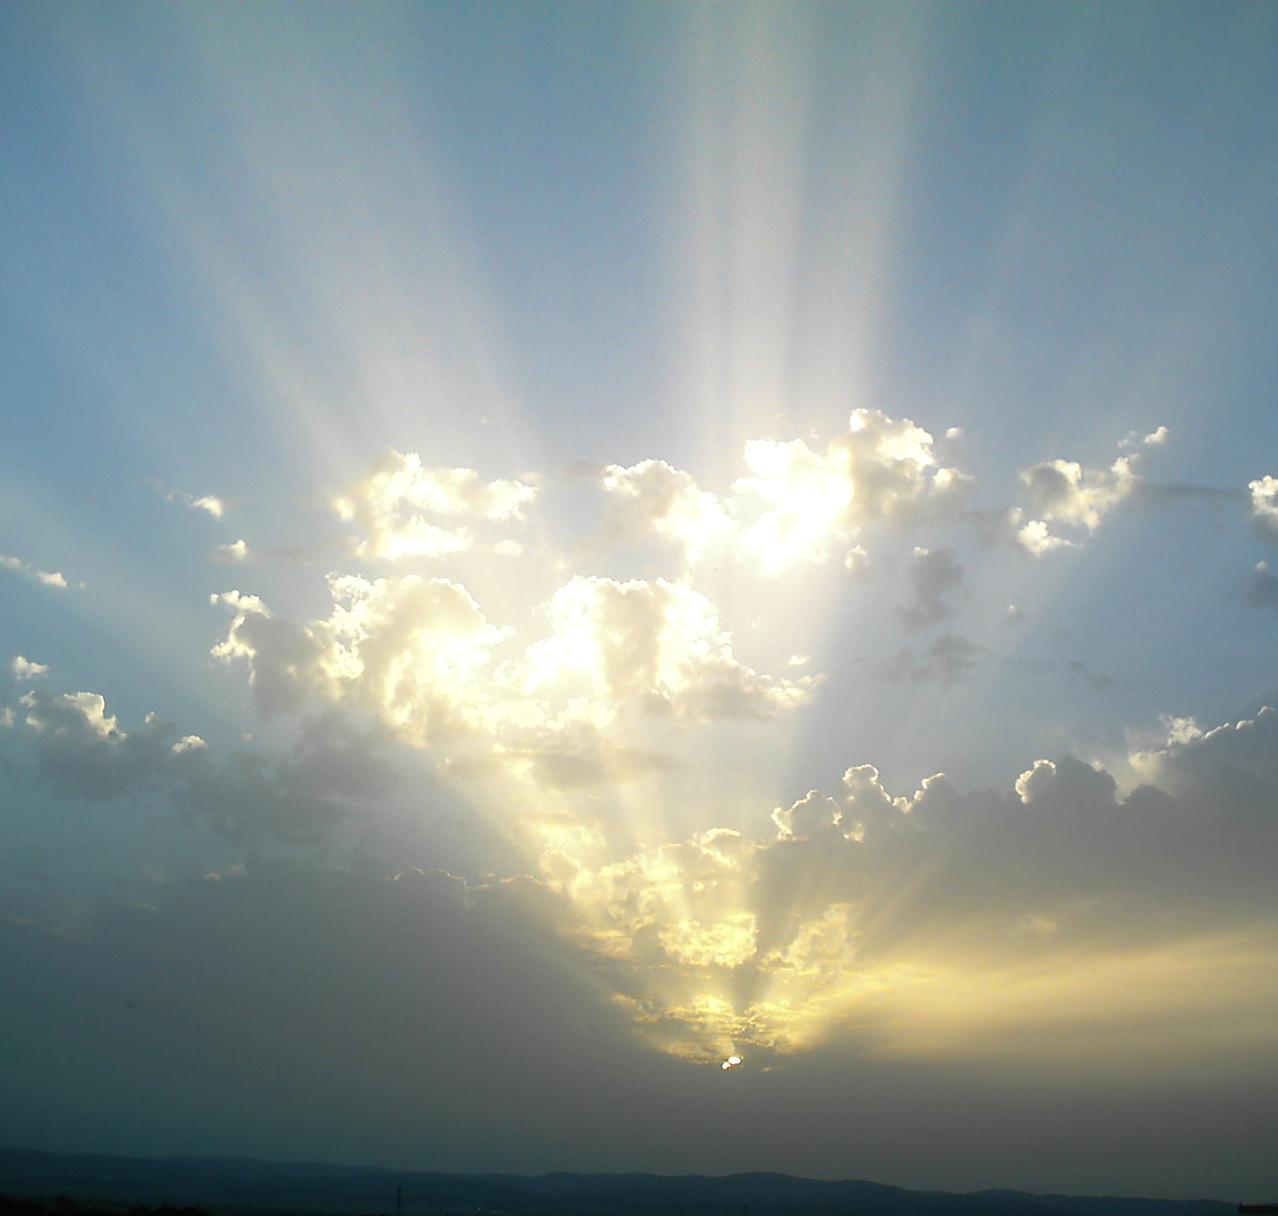 sunset-1-1402921-1278x1216.jpg